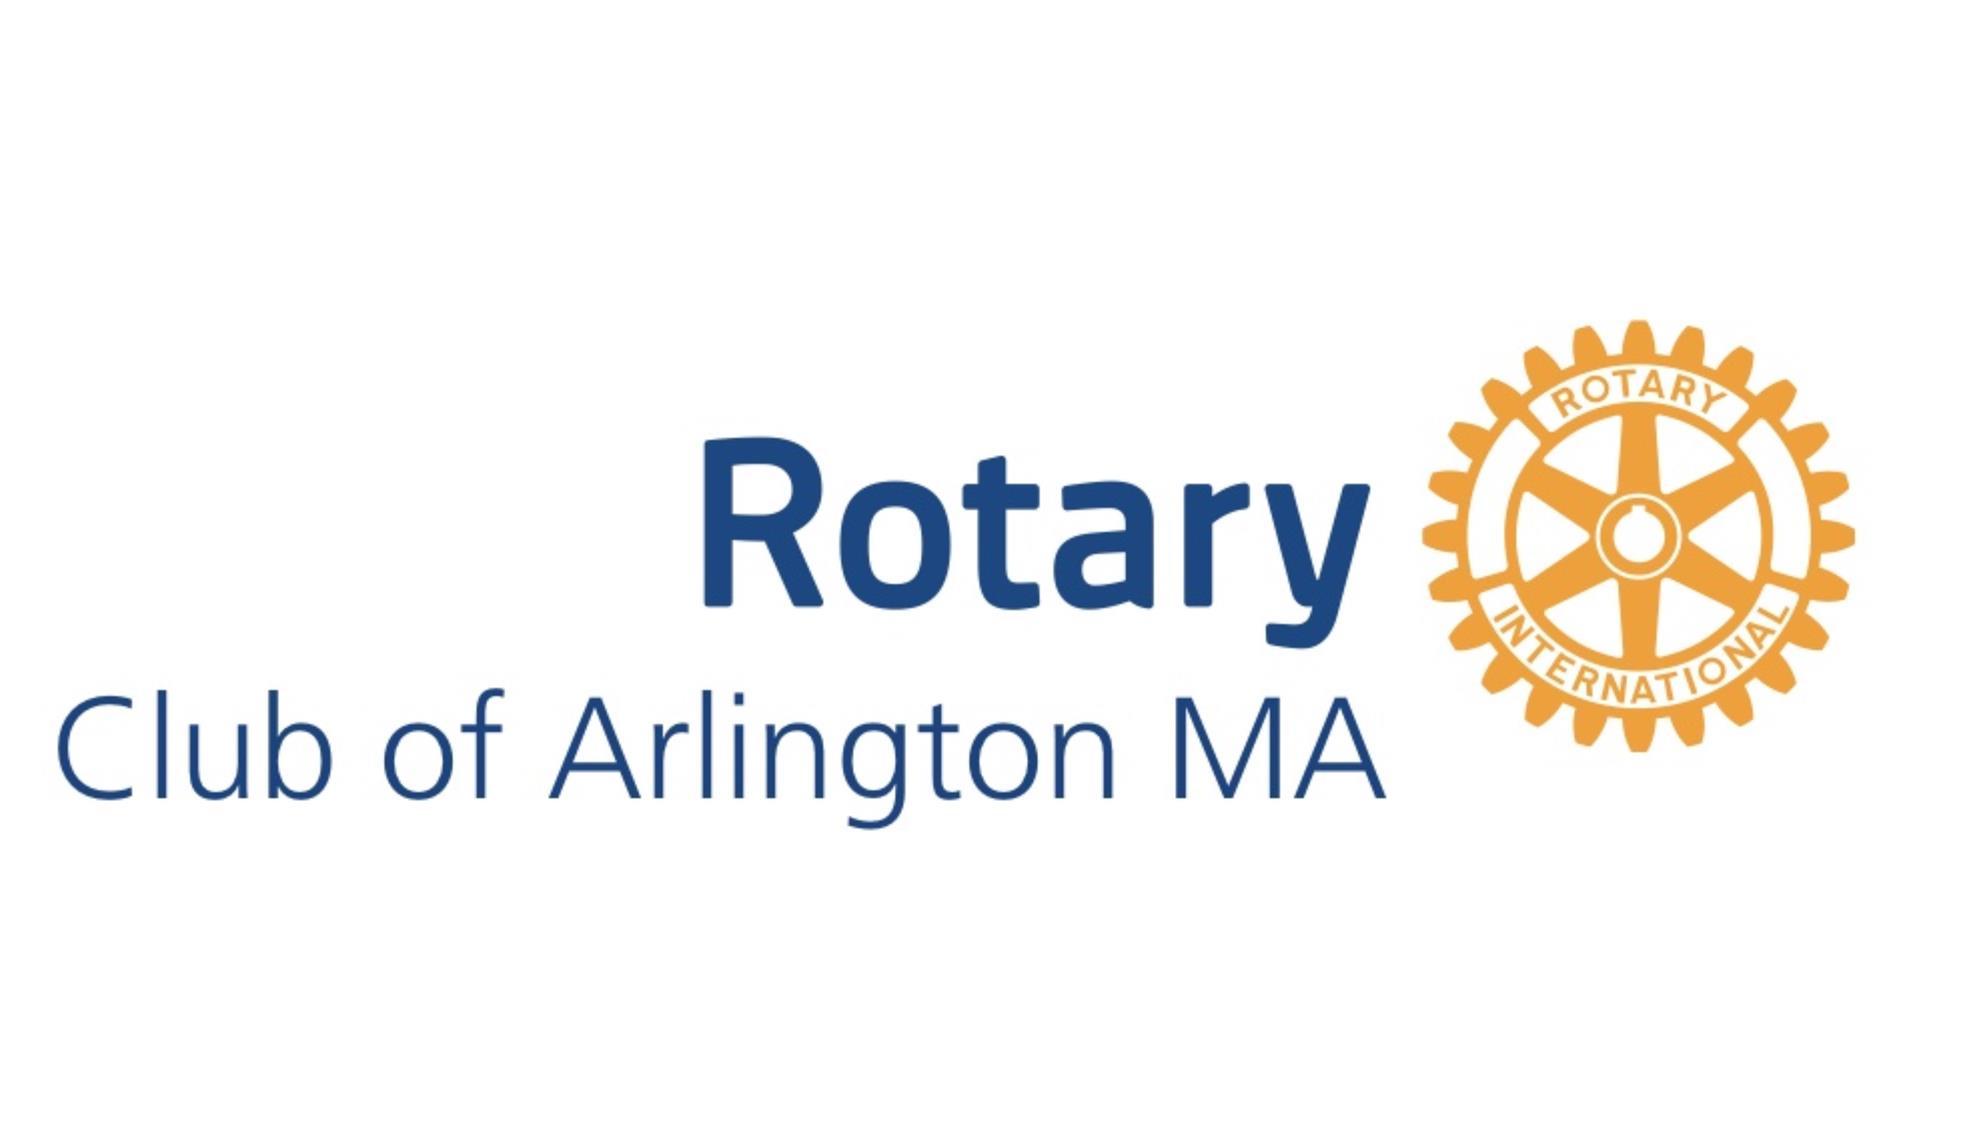 Arlington-MA logo